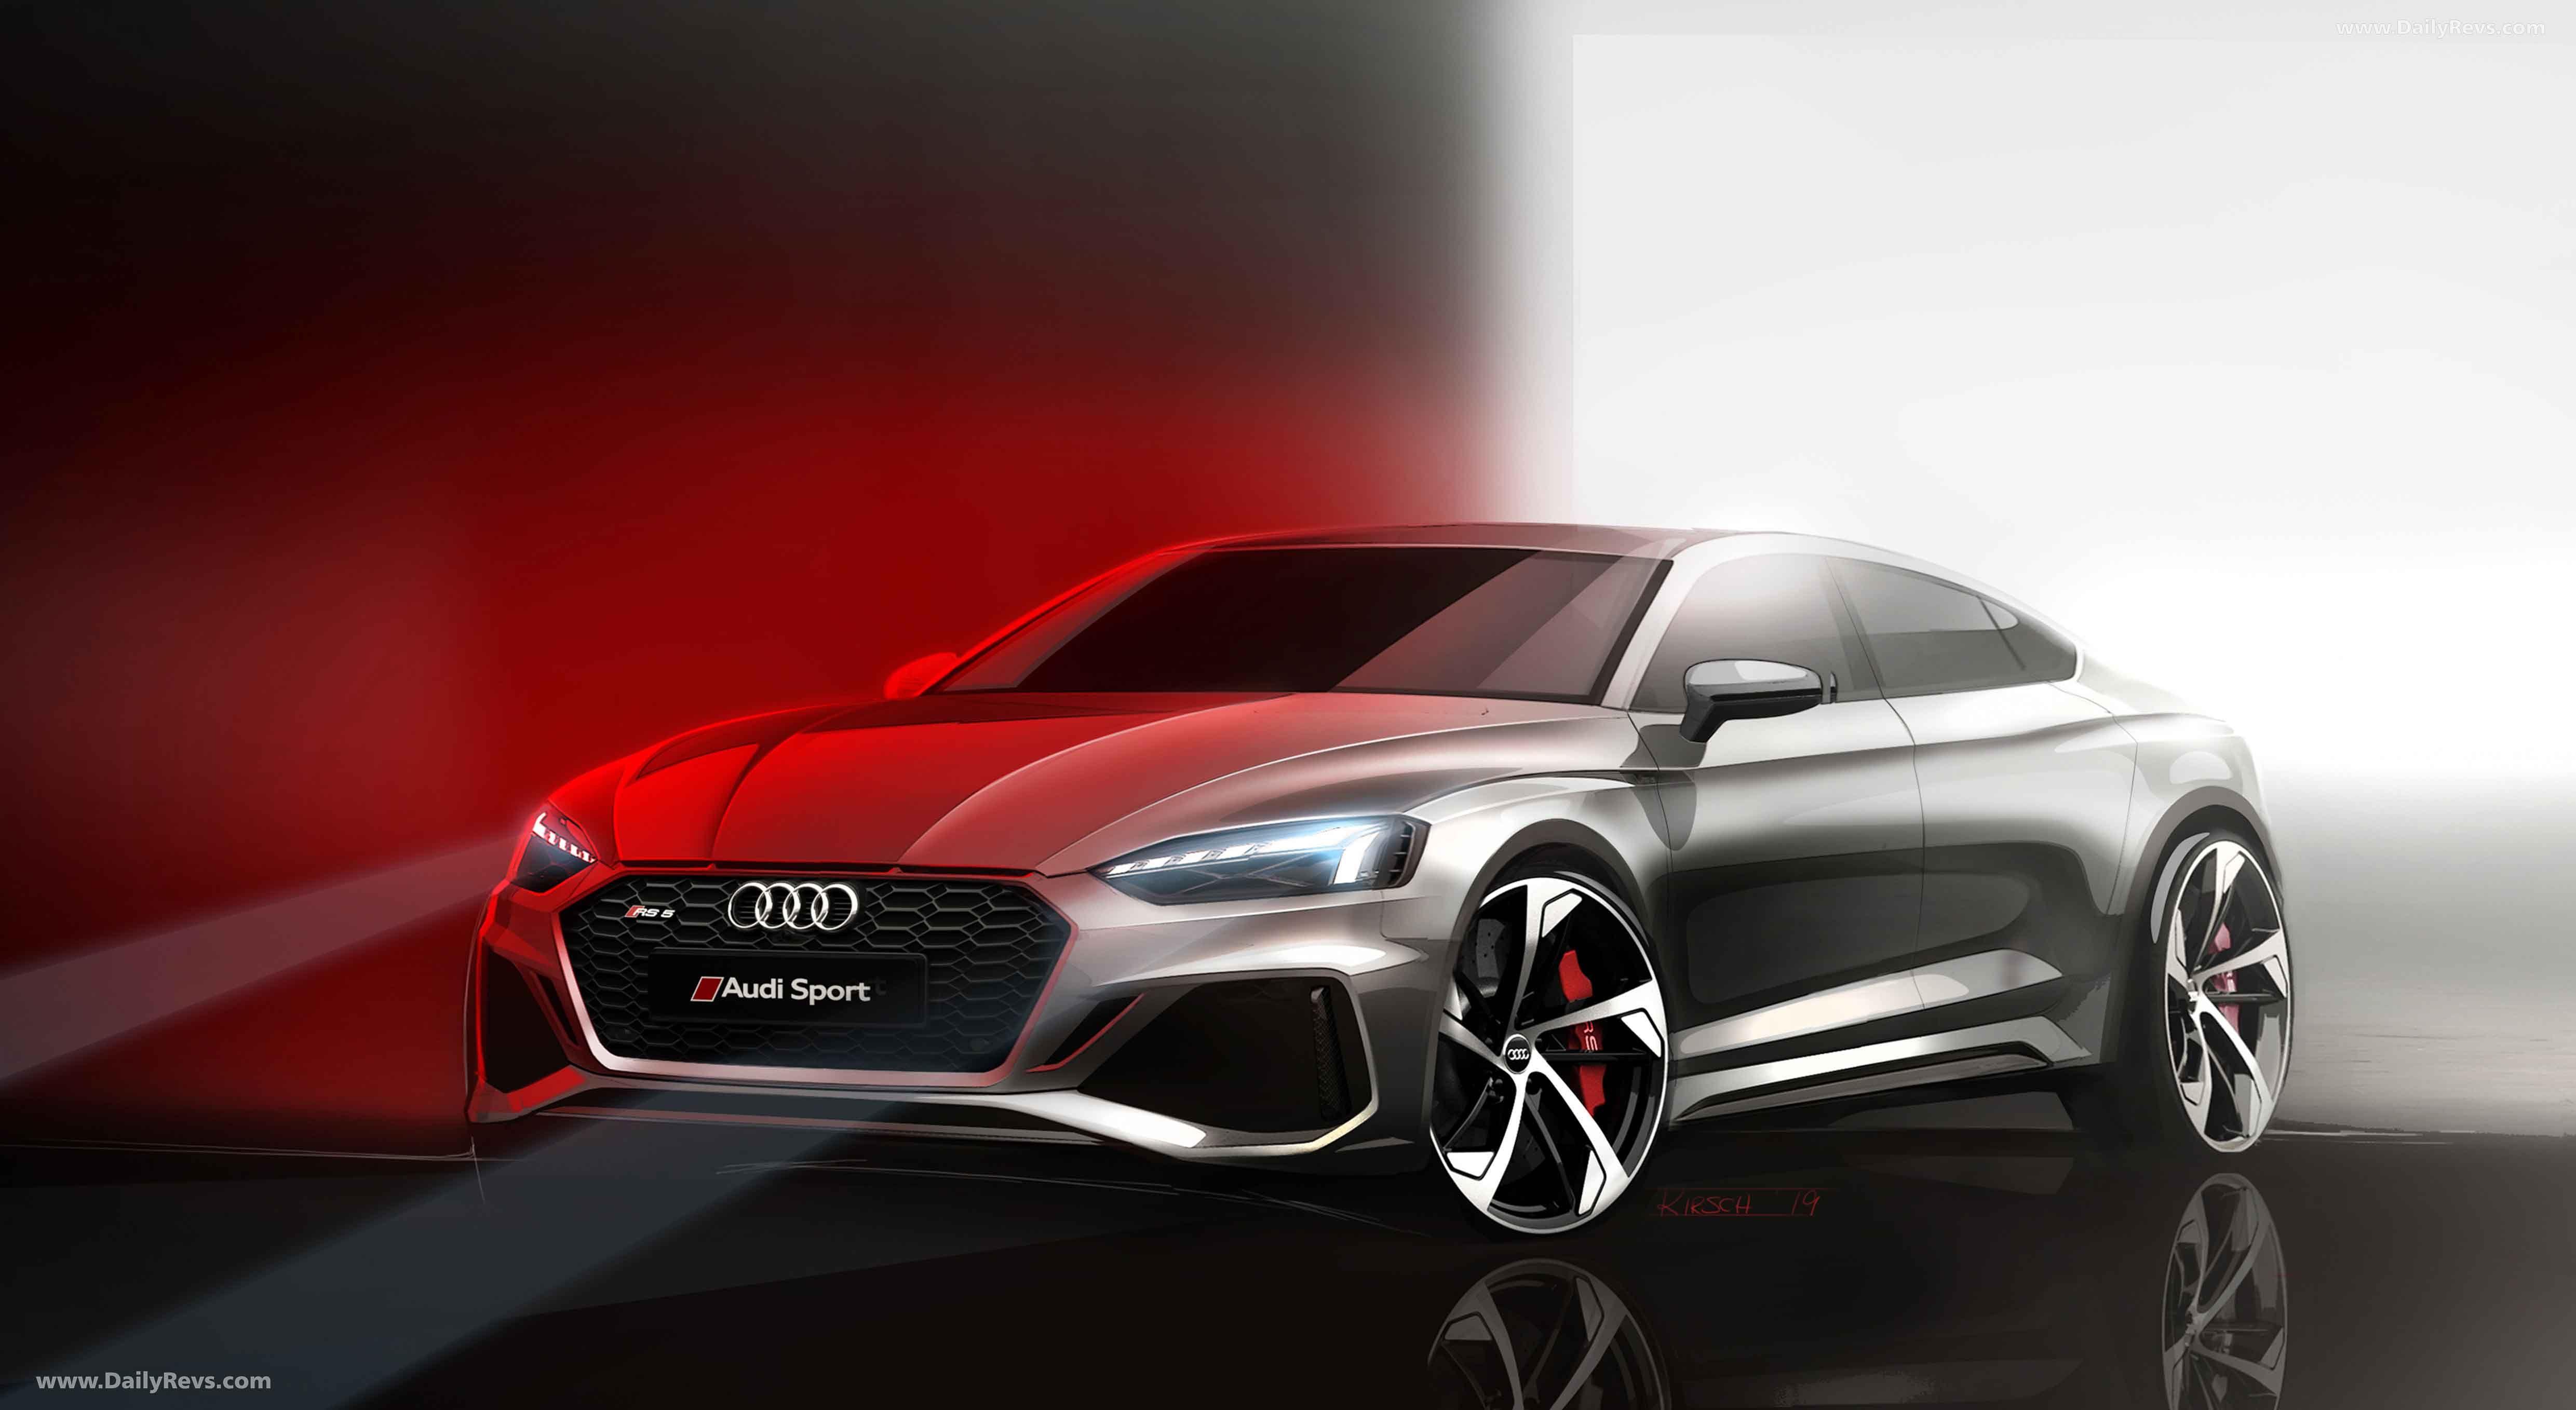 2020 Audi Rs5 Sportback Dailyrevs Com In 2020 Audi Rs5 Audi Rs5 Sportback Audi